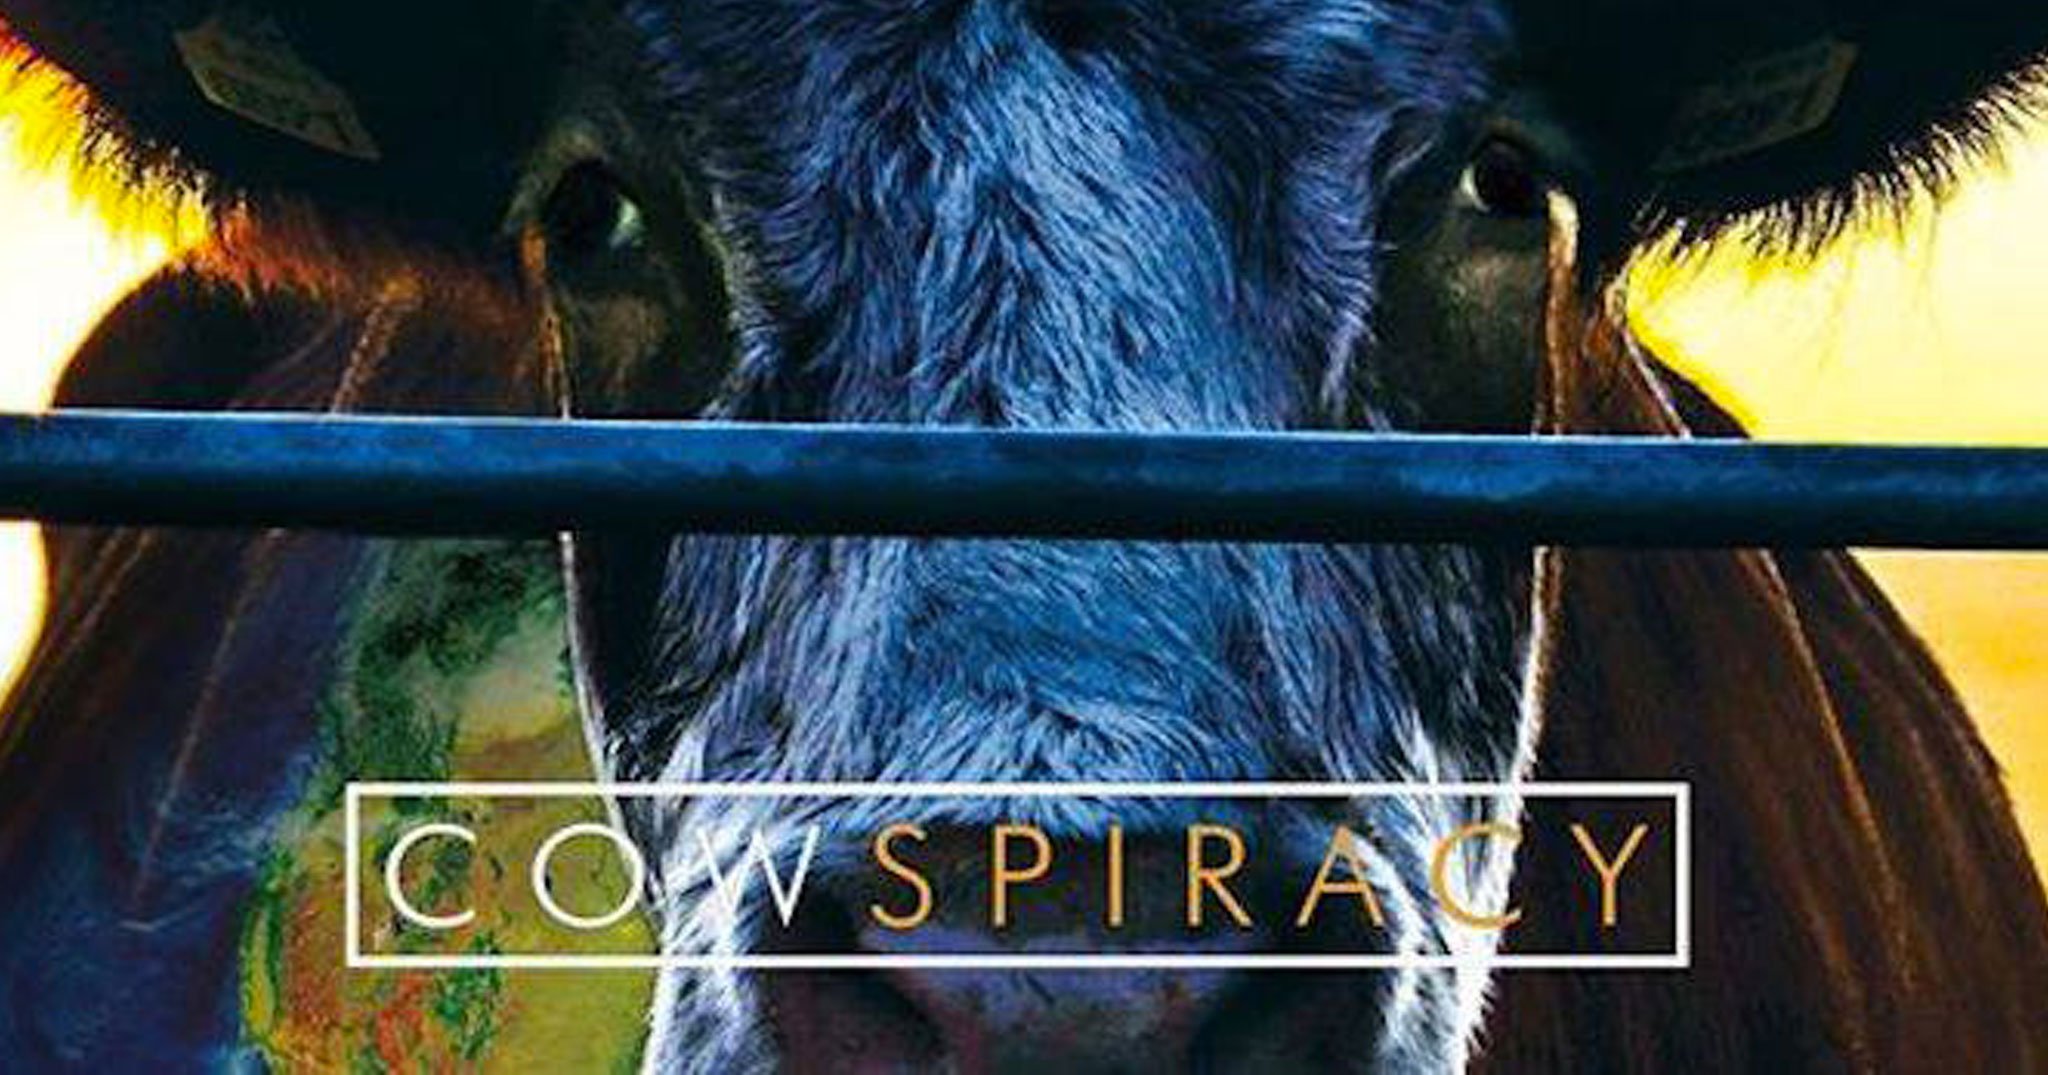 Proiezione Film/Documentario Cowspiracy - Vivere Vegan